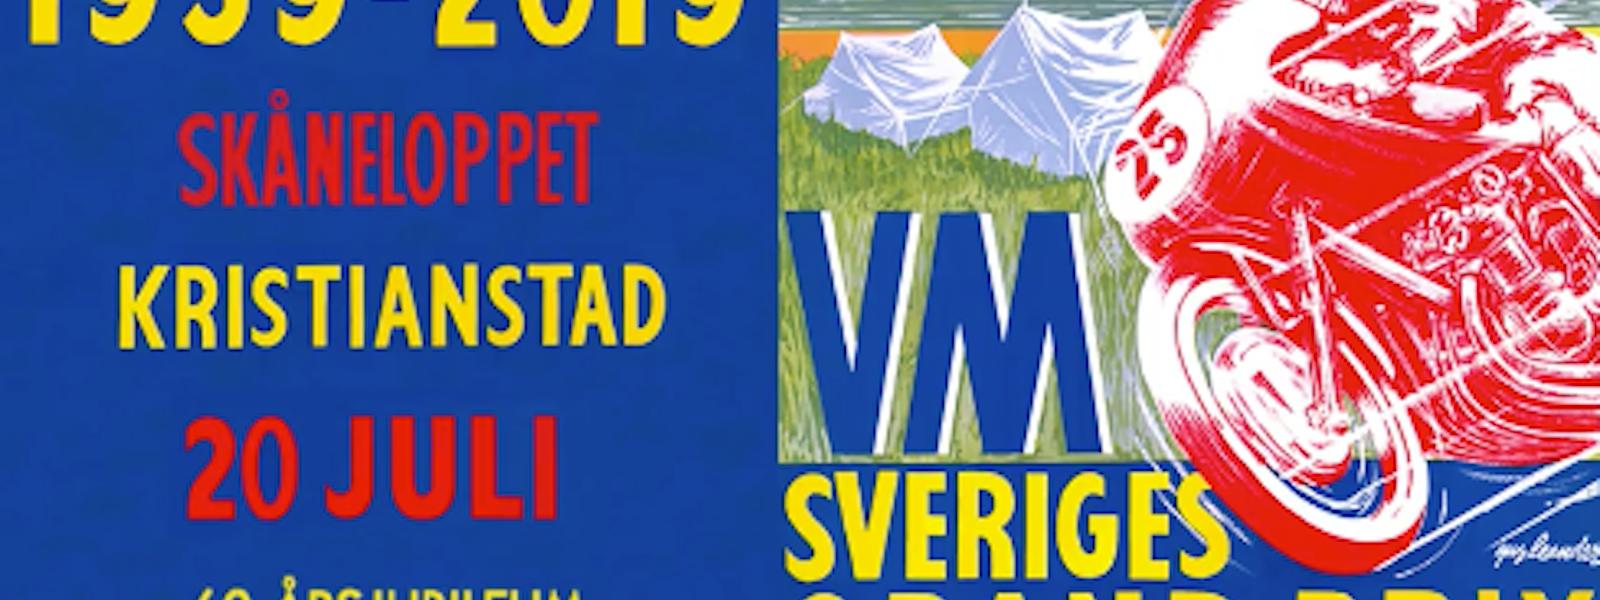 Bild - Skåneloppet 60 år